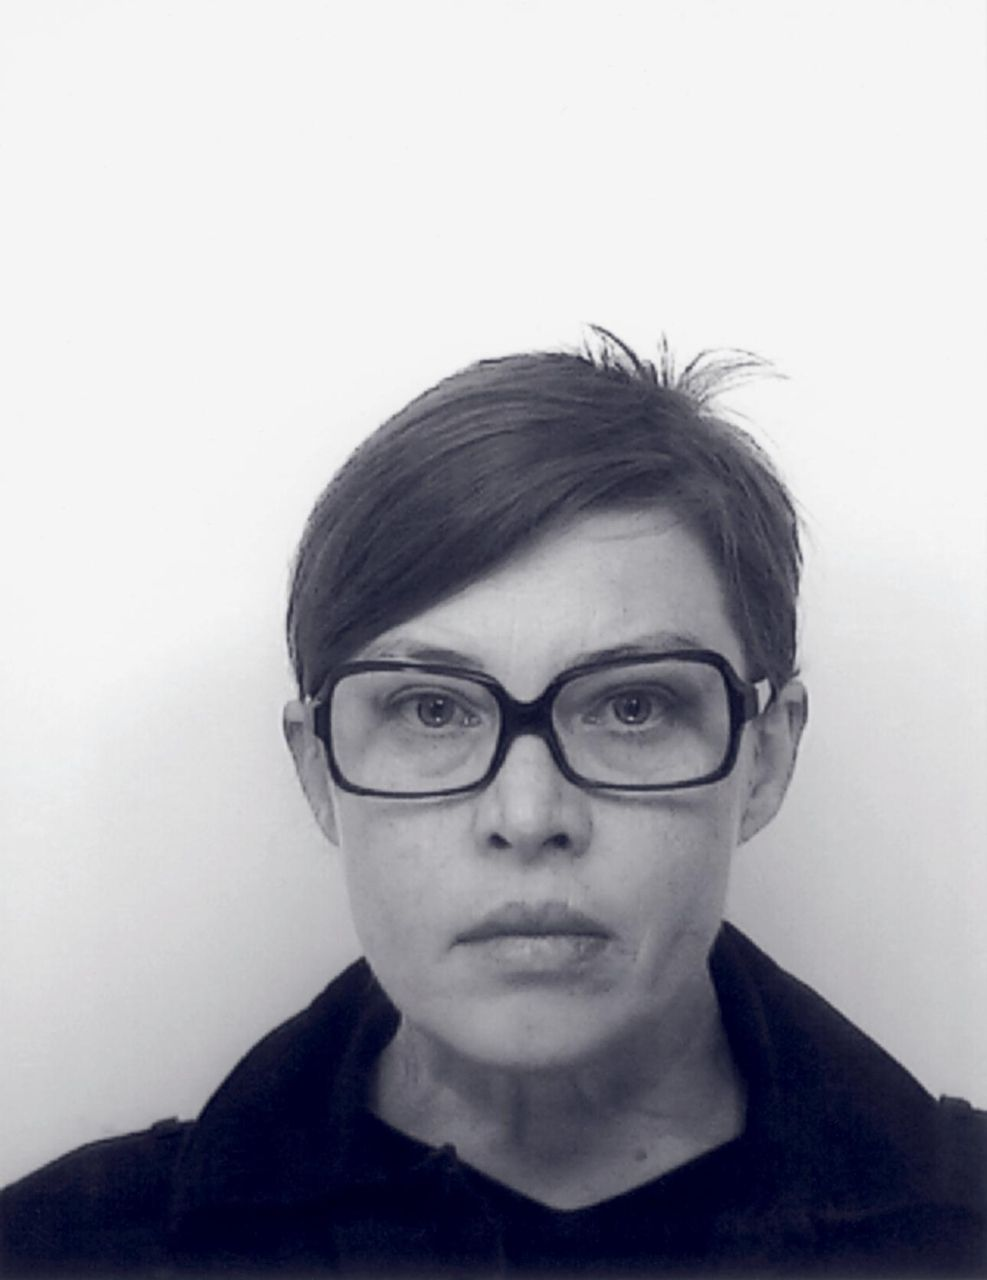 headshot of Cosima von Bonin in black and white